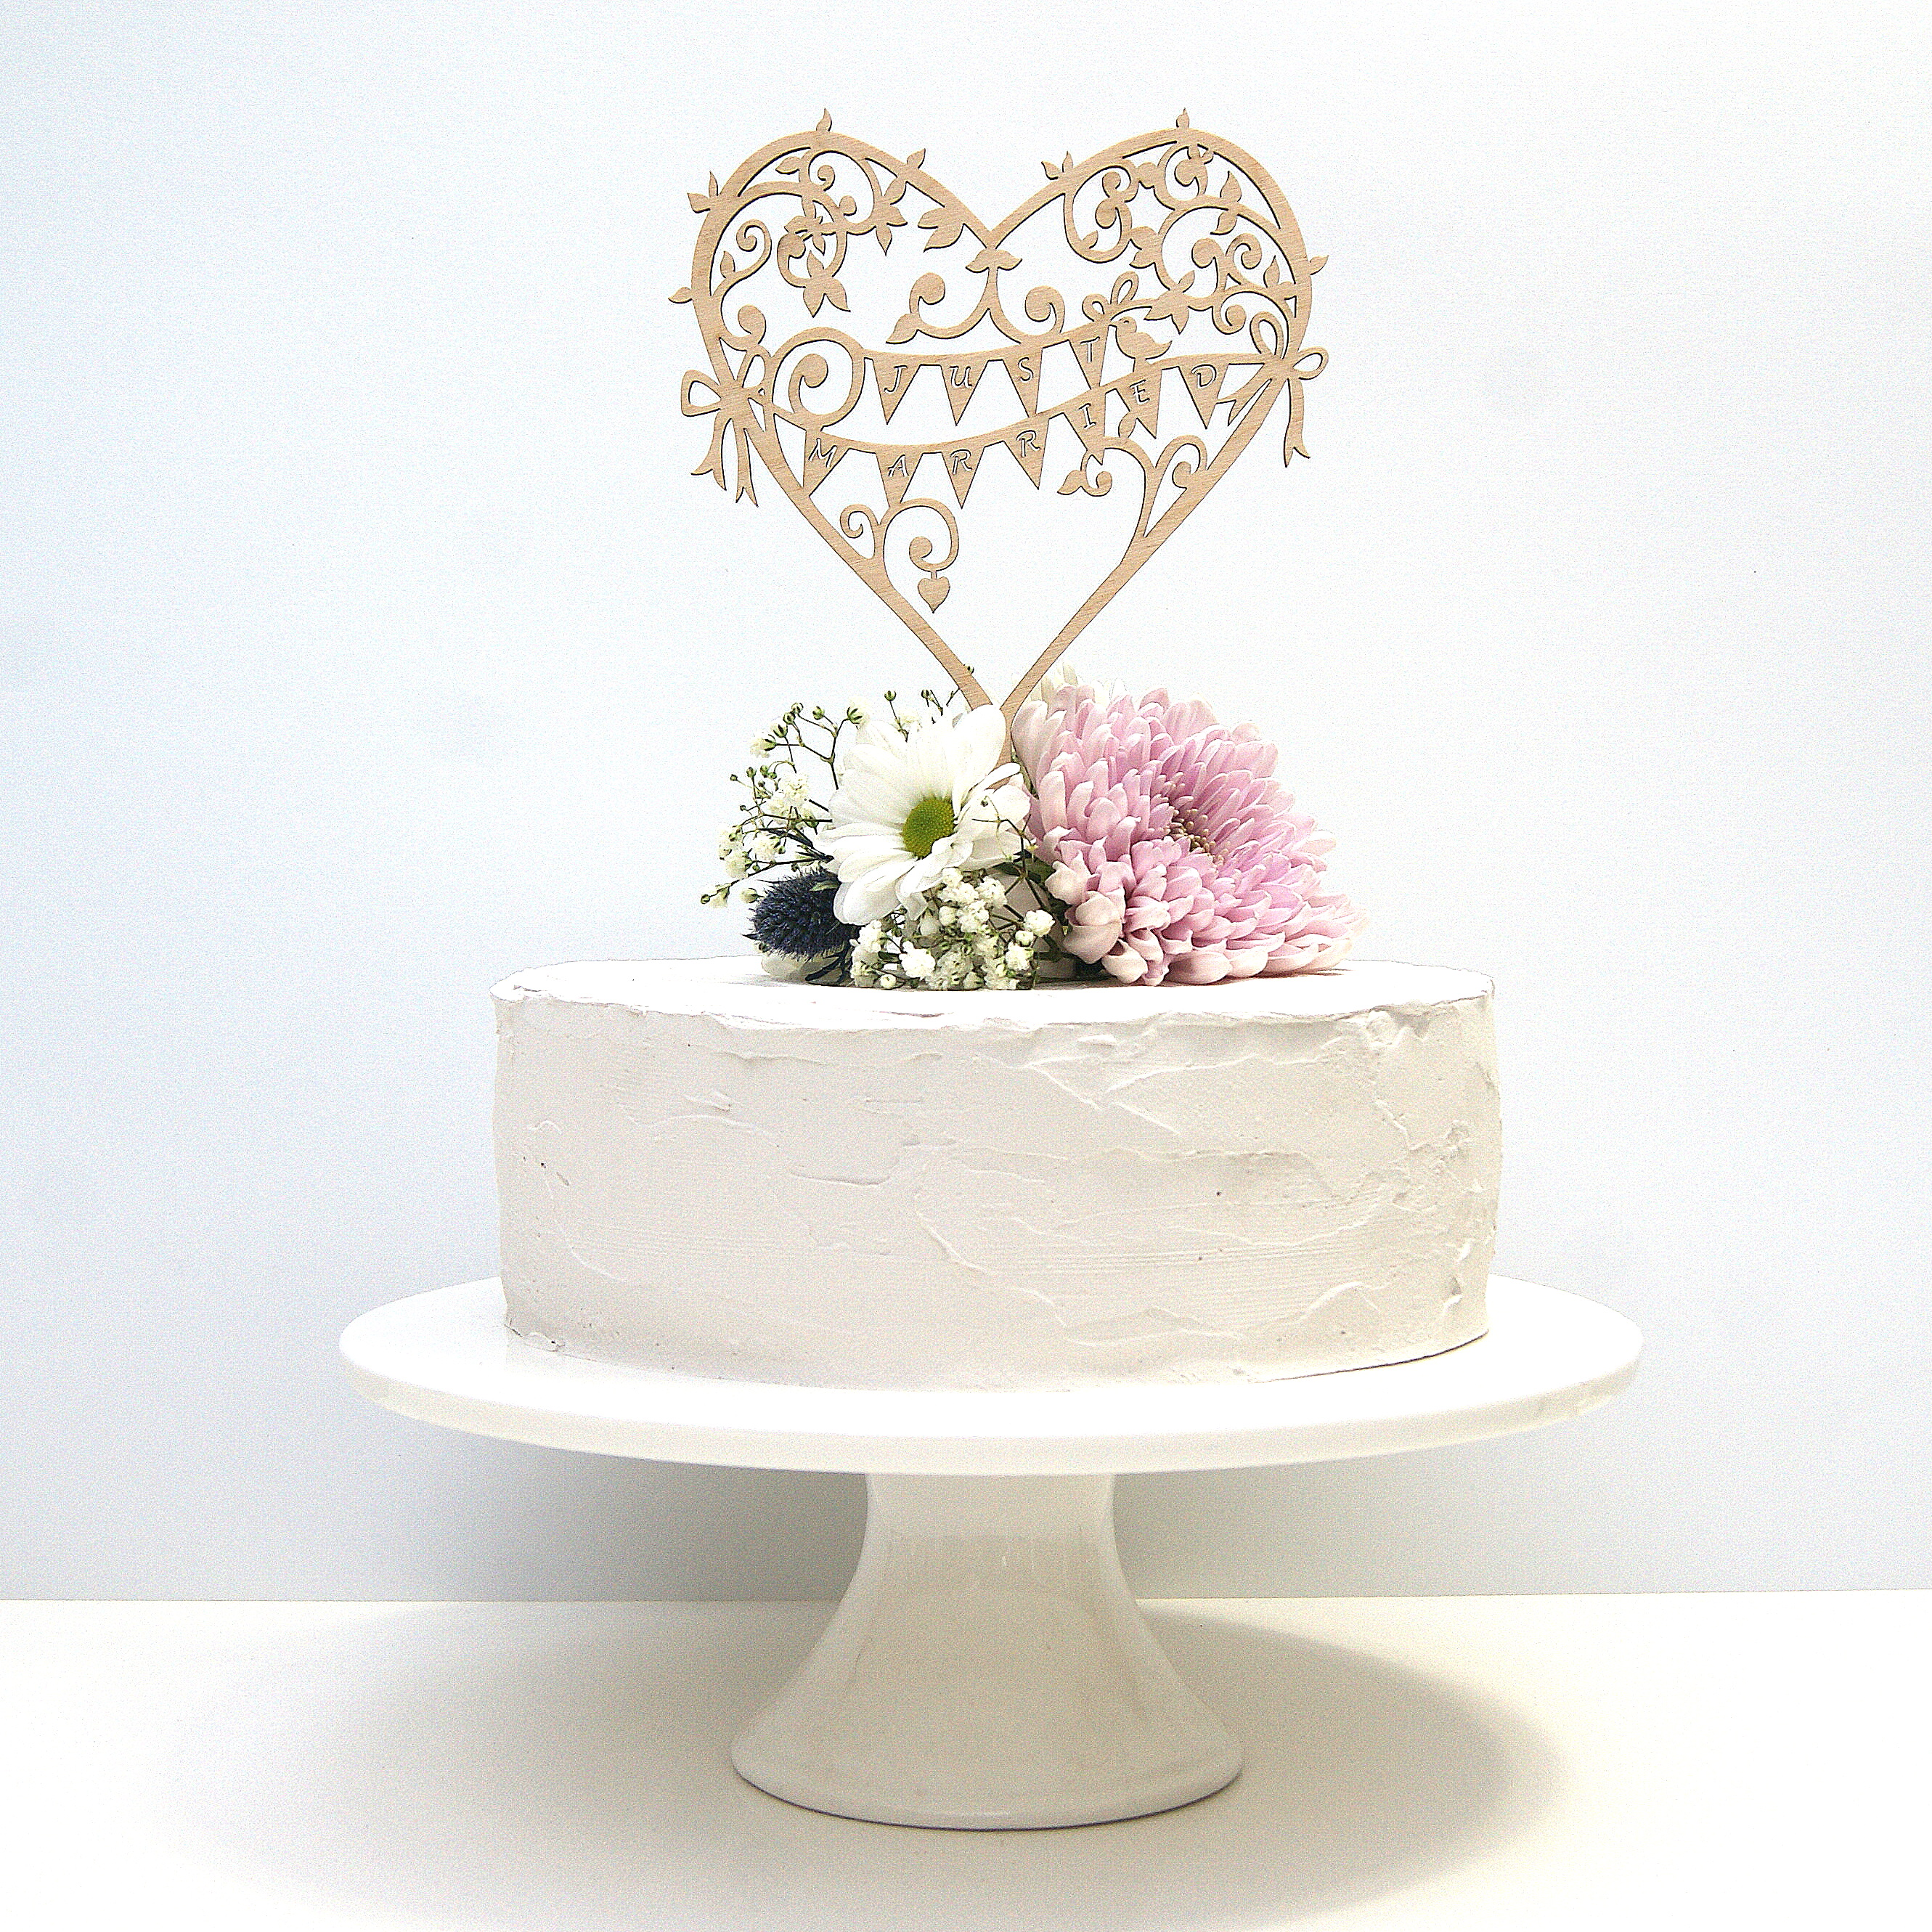 Garden Party Cake Toppers - Hummingbird Card Company Blog